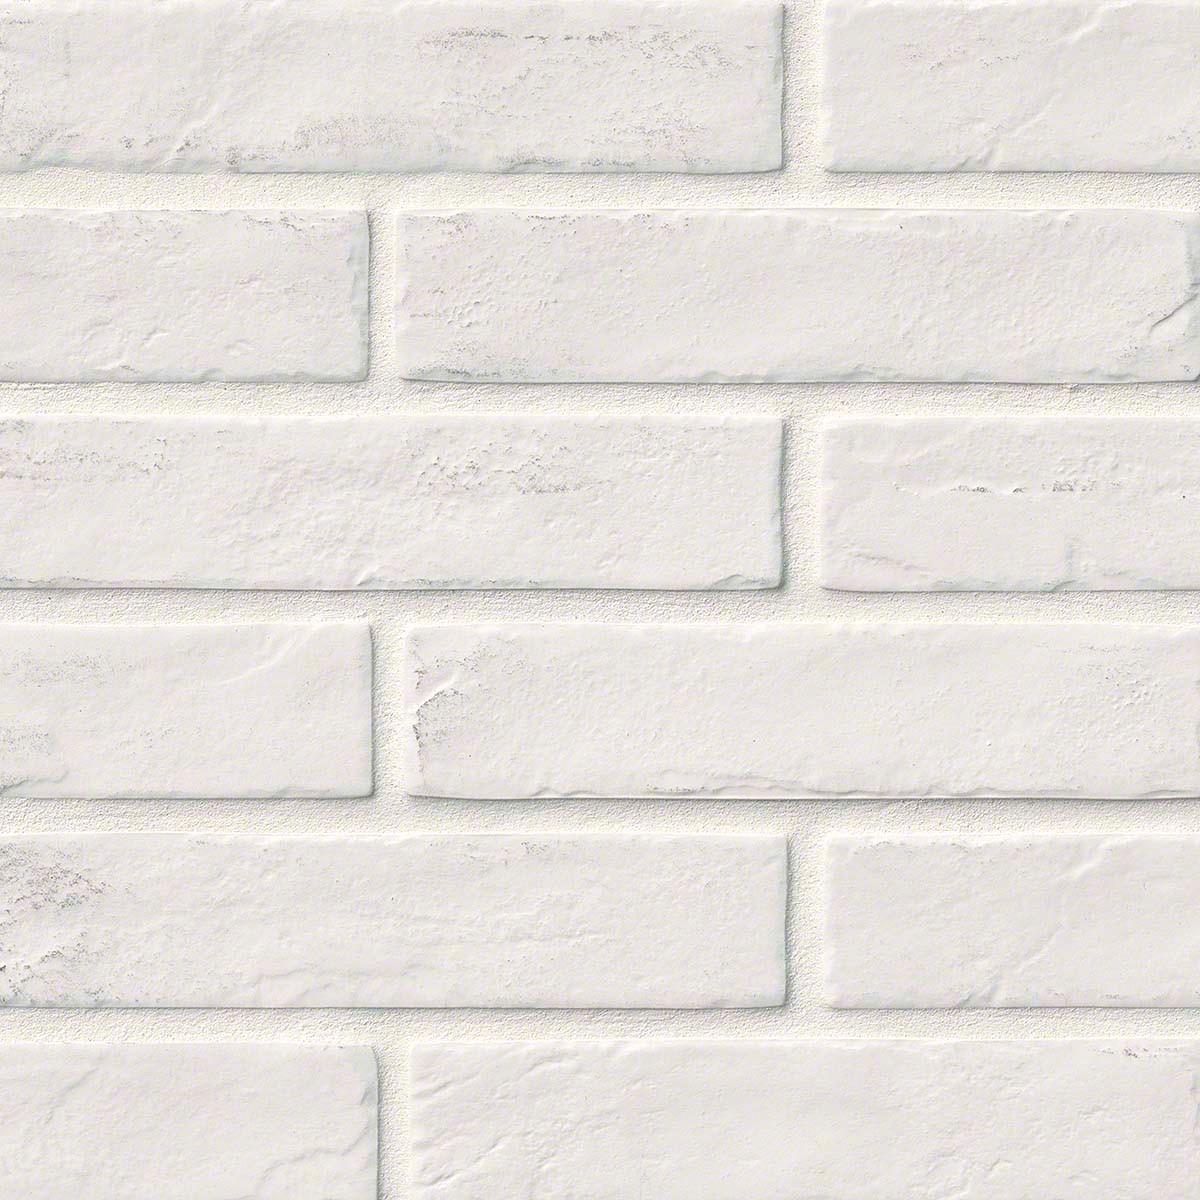 Brickstone White 2x10 Tiles Direct Store